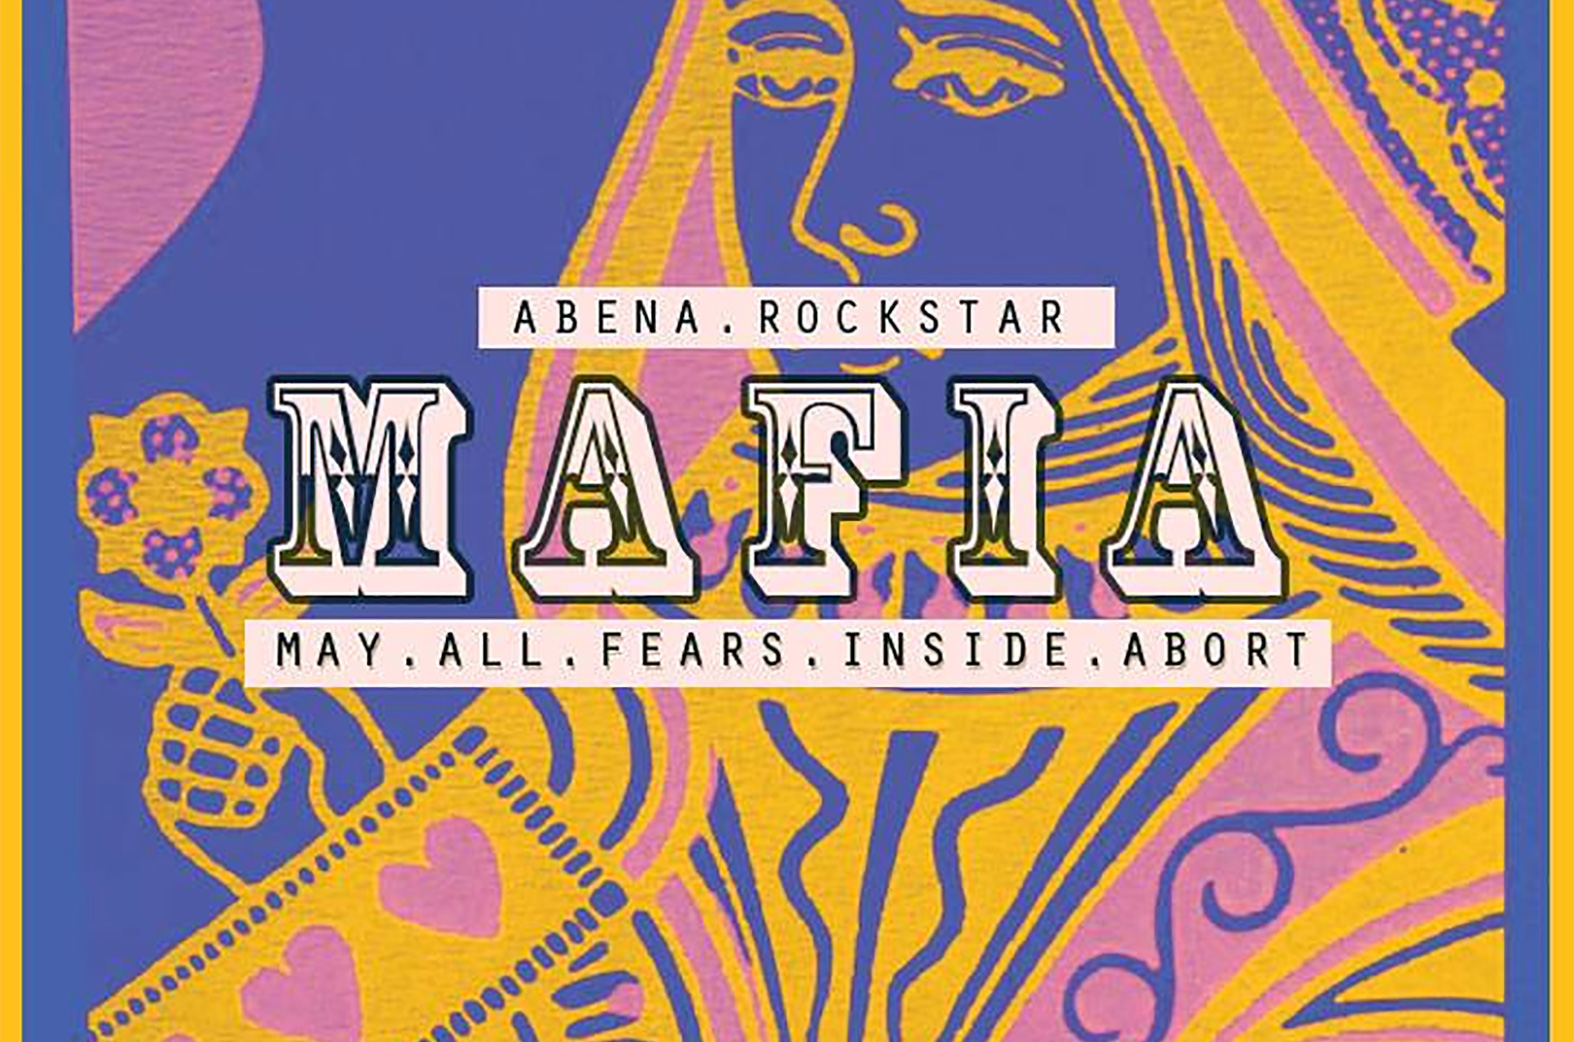 Abena Rockstar - MAFIA (May All Fears Inside Abort)